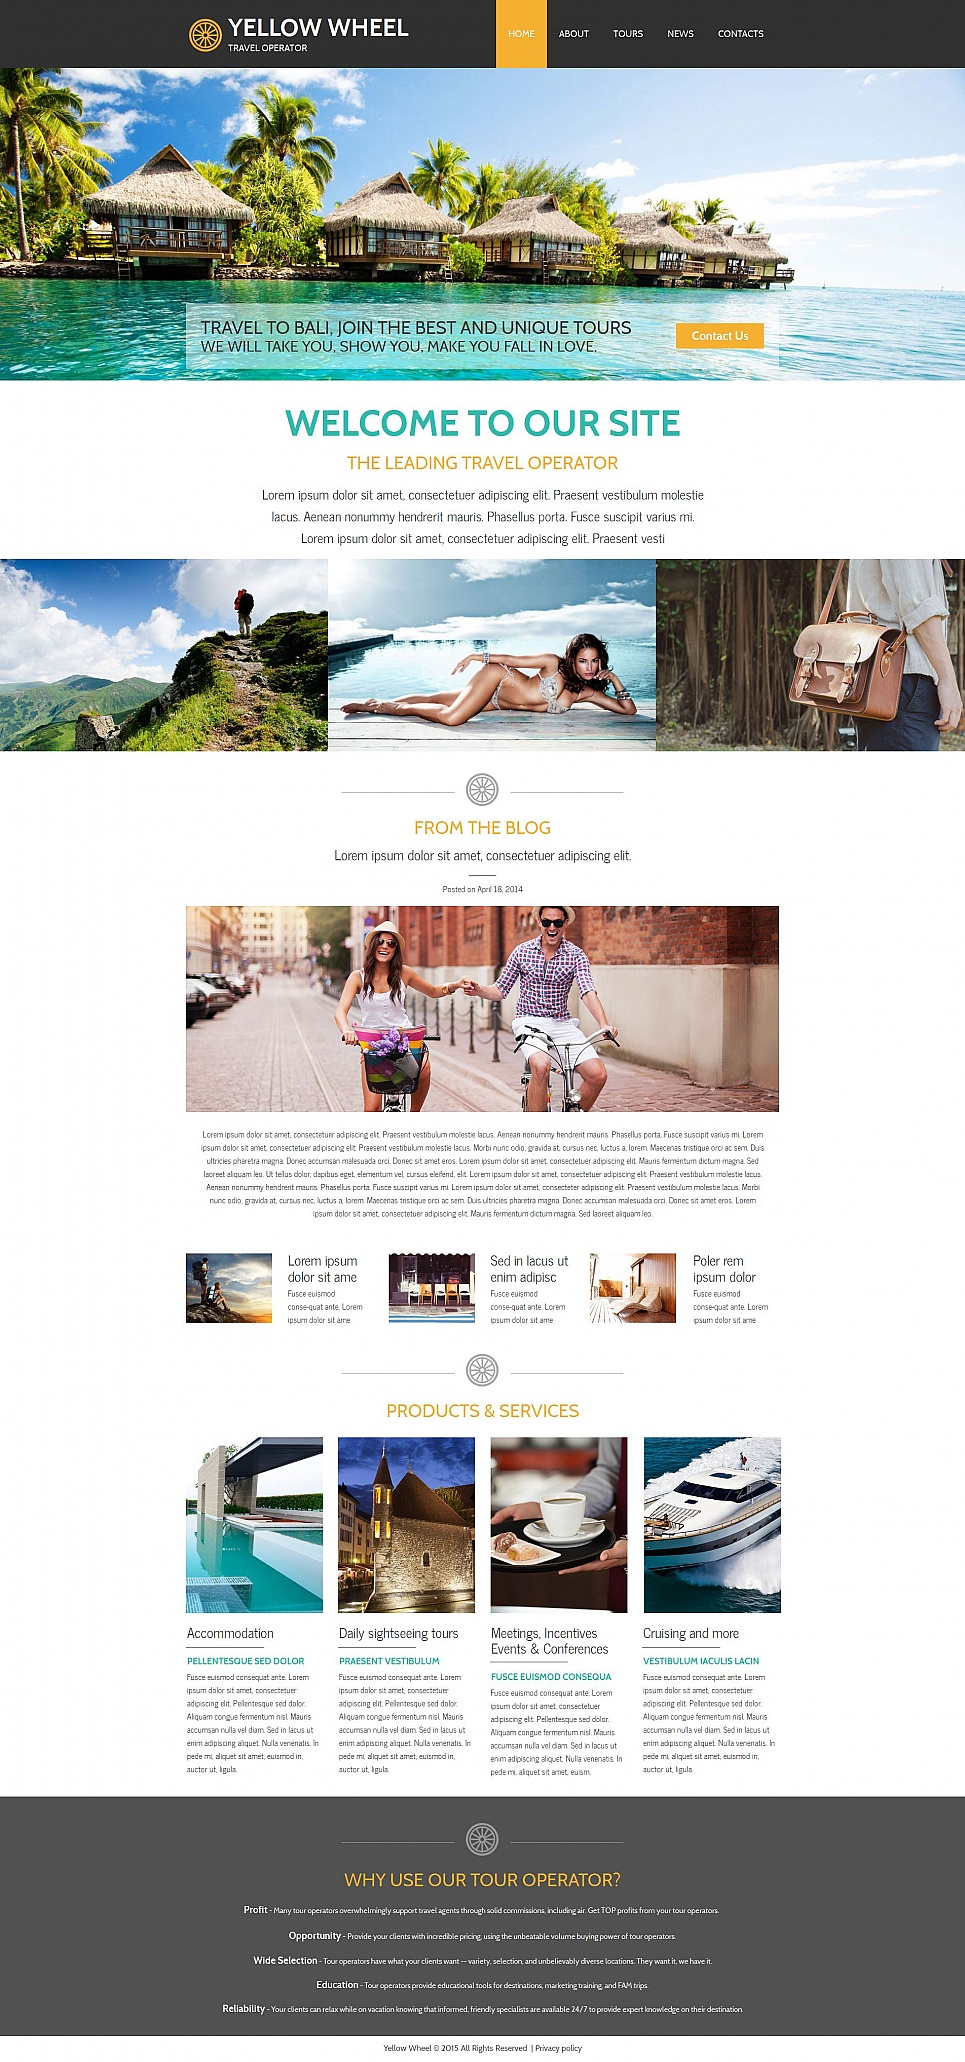 Tourist agency site design